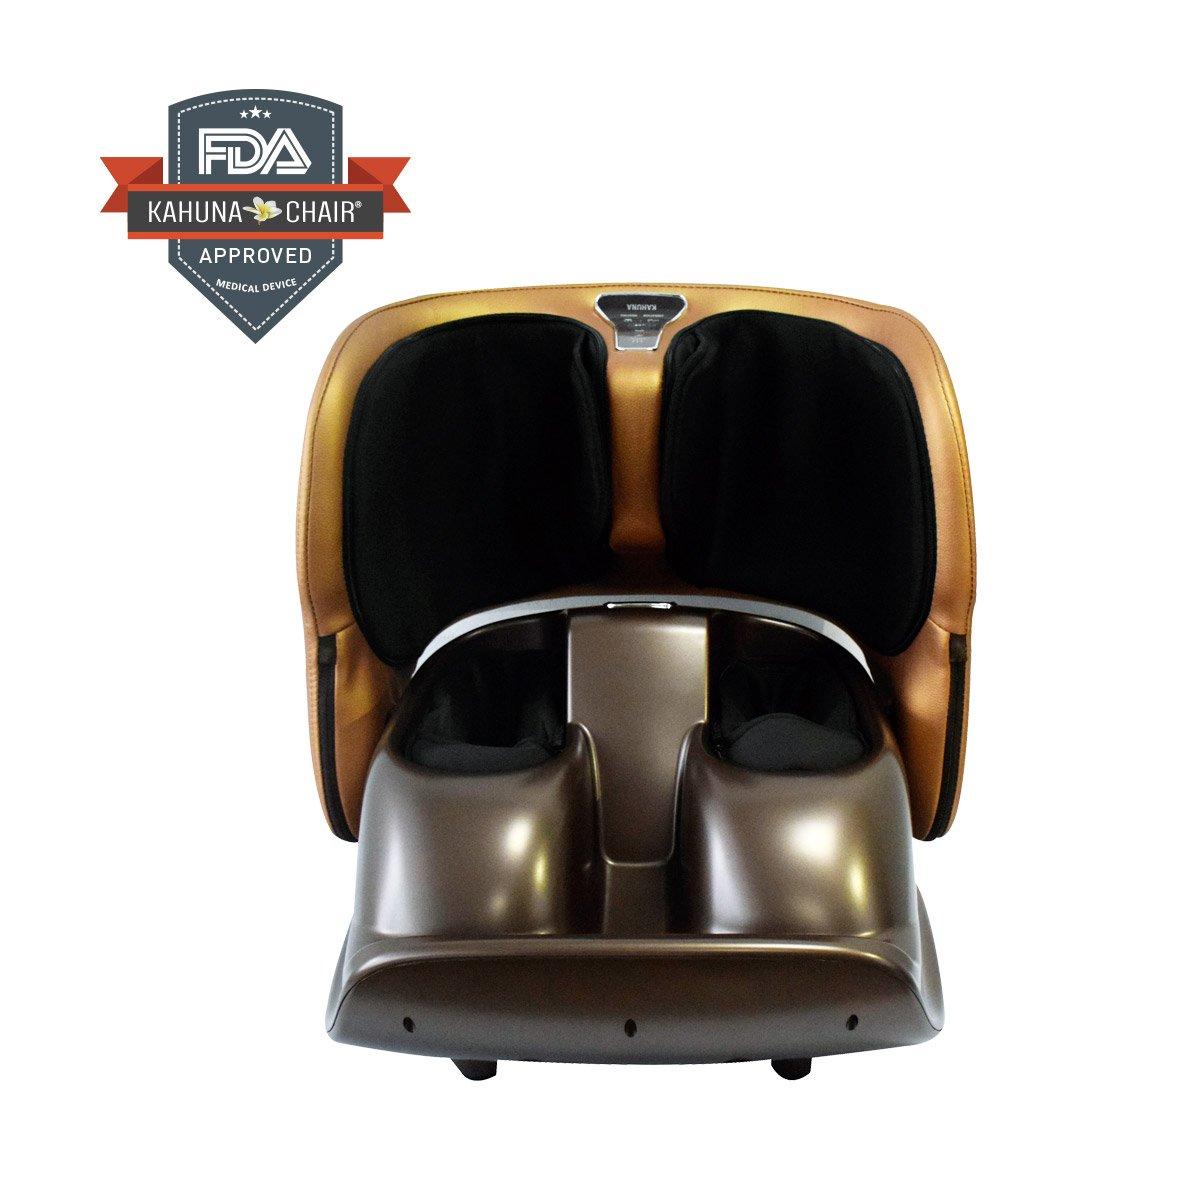 Compact Portable Kahuna Foot Massager PAU - Brown